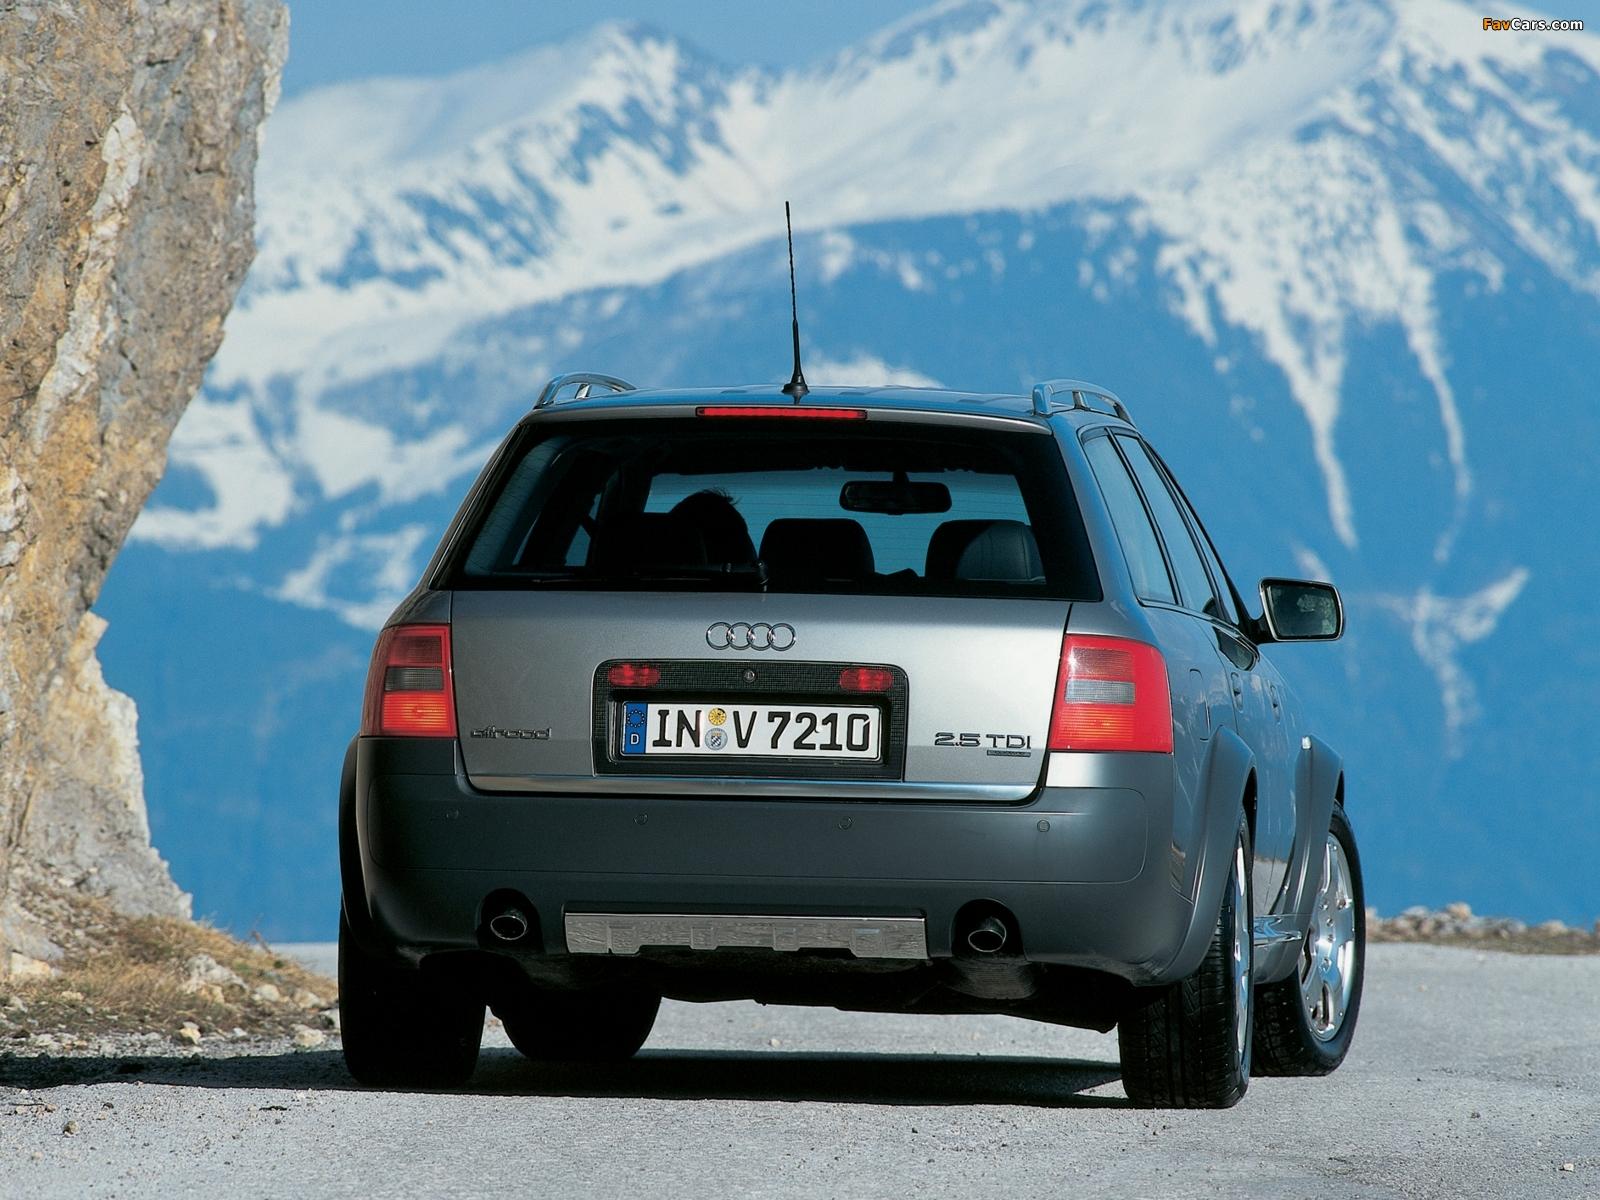 Best Car Wallpaper 2000 Audi allroad quattro 2 7T